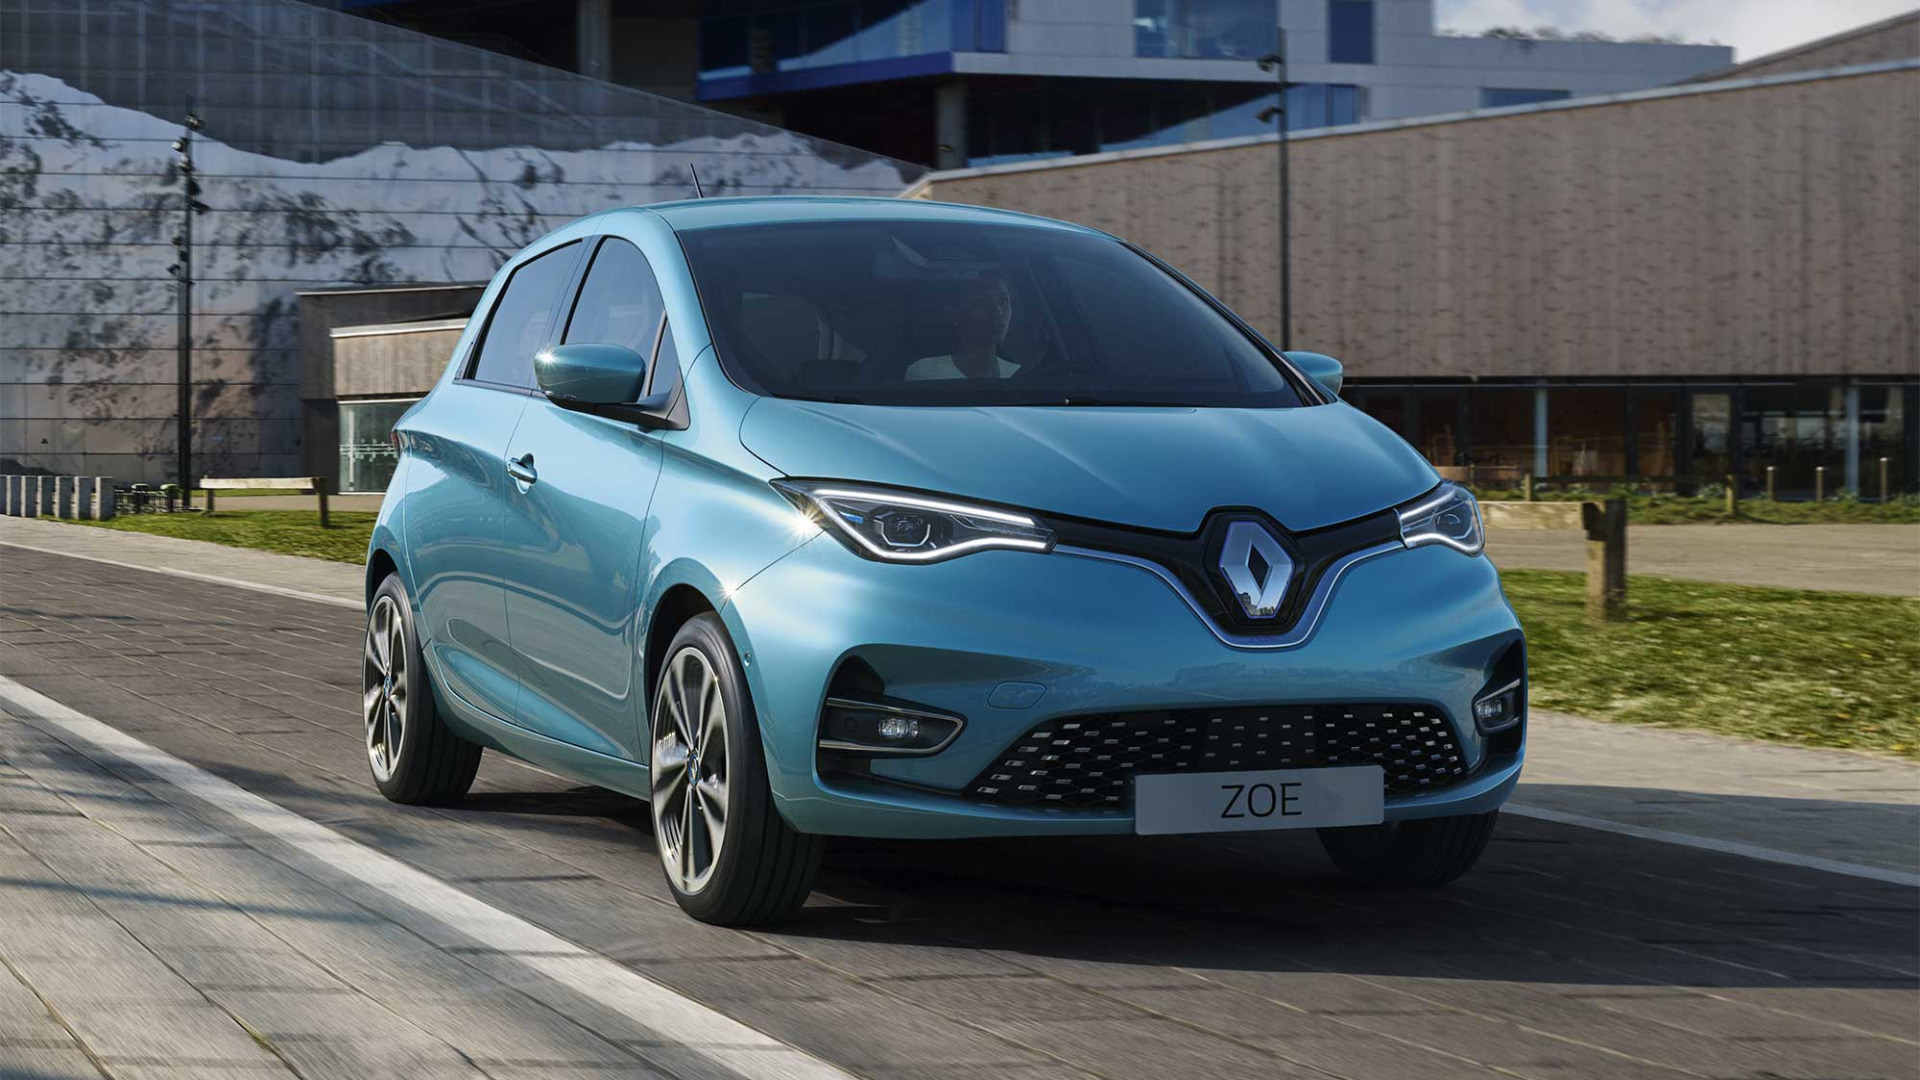 Elektroautos, Zoe, Renault, renault zoe